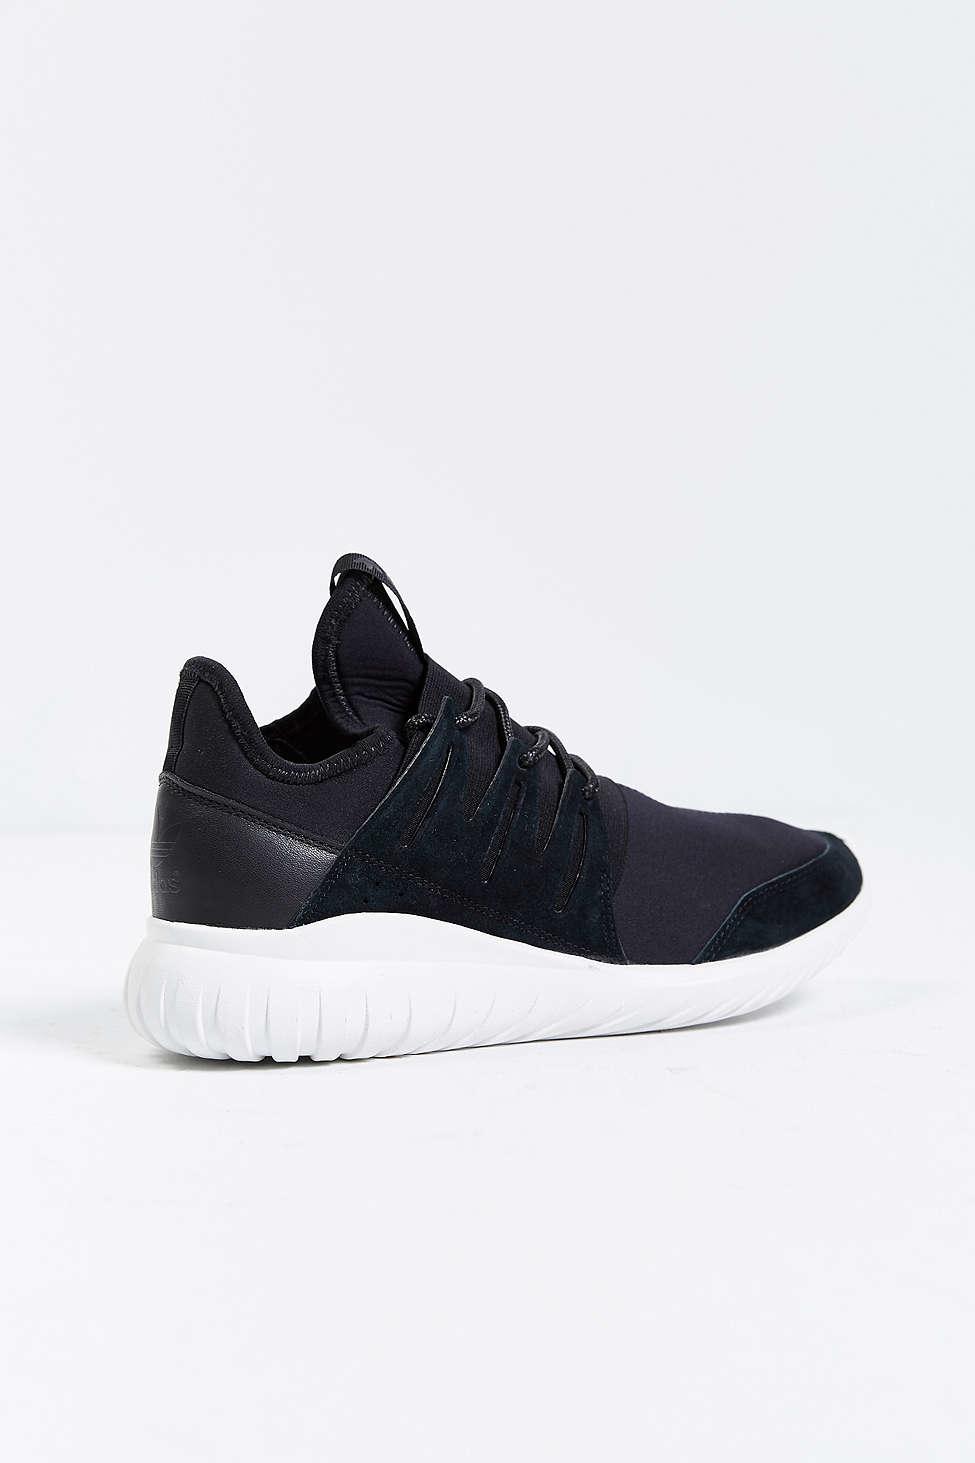 Adidas Tubular Radial Sneaker